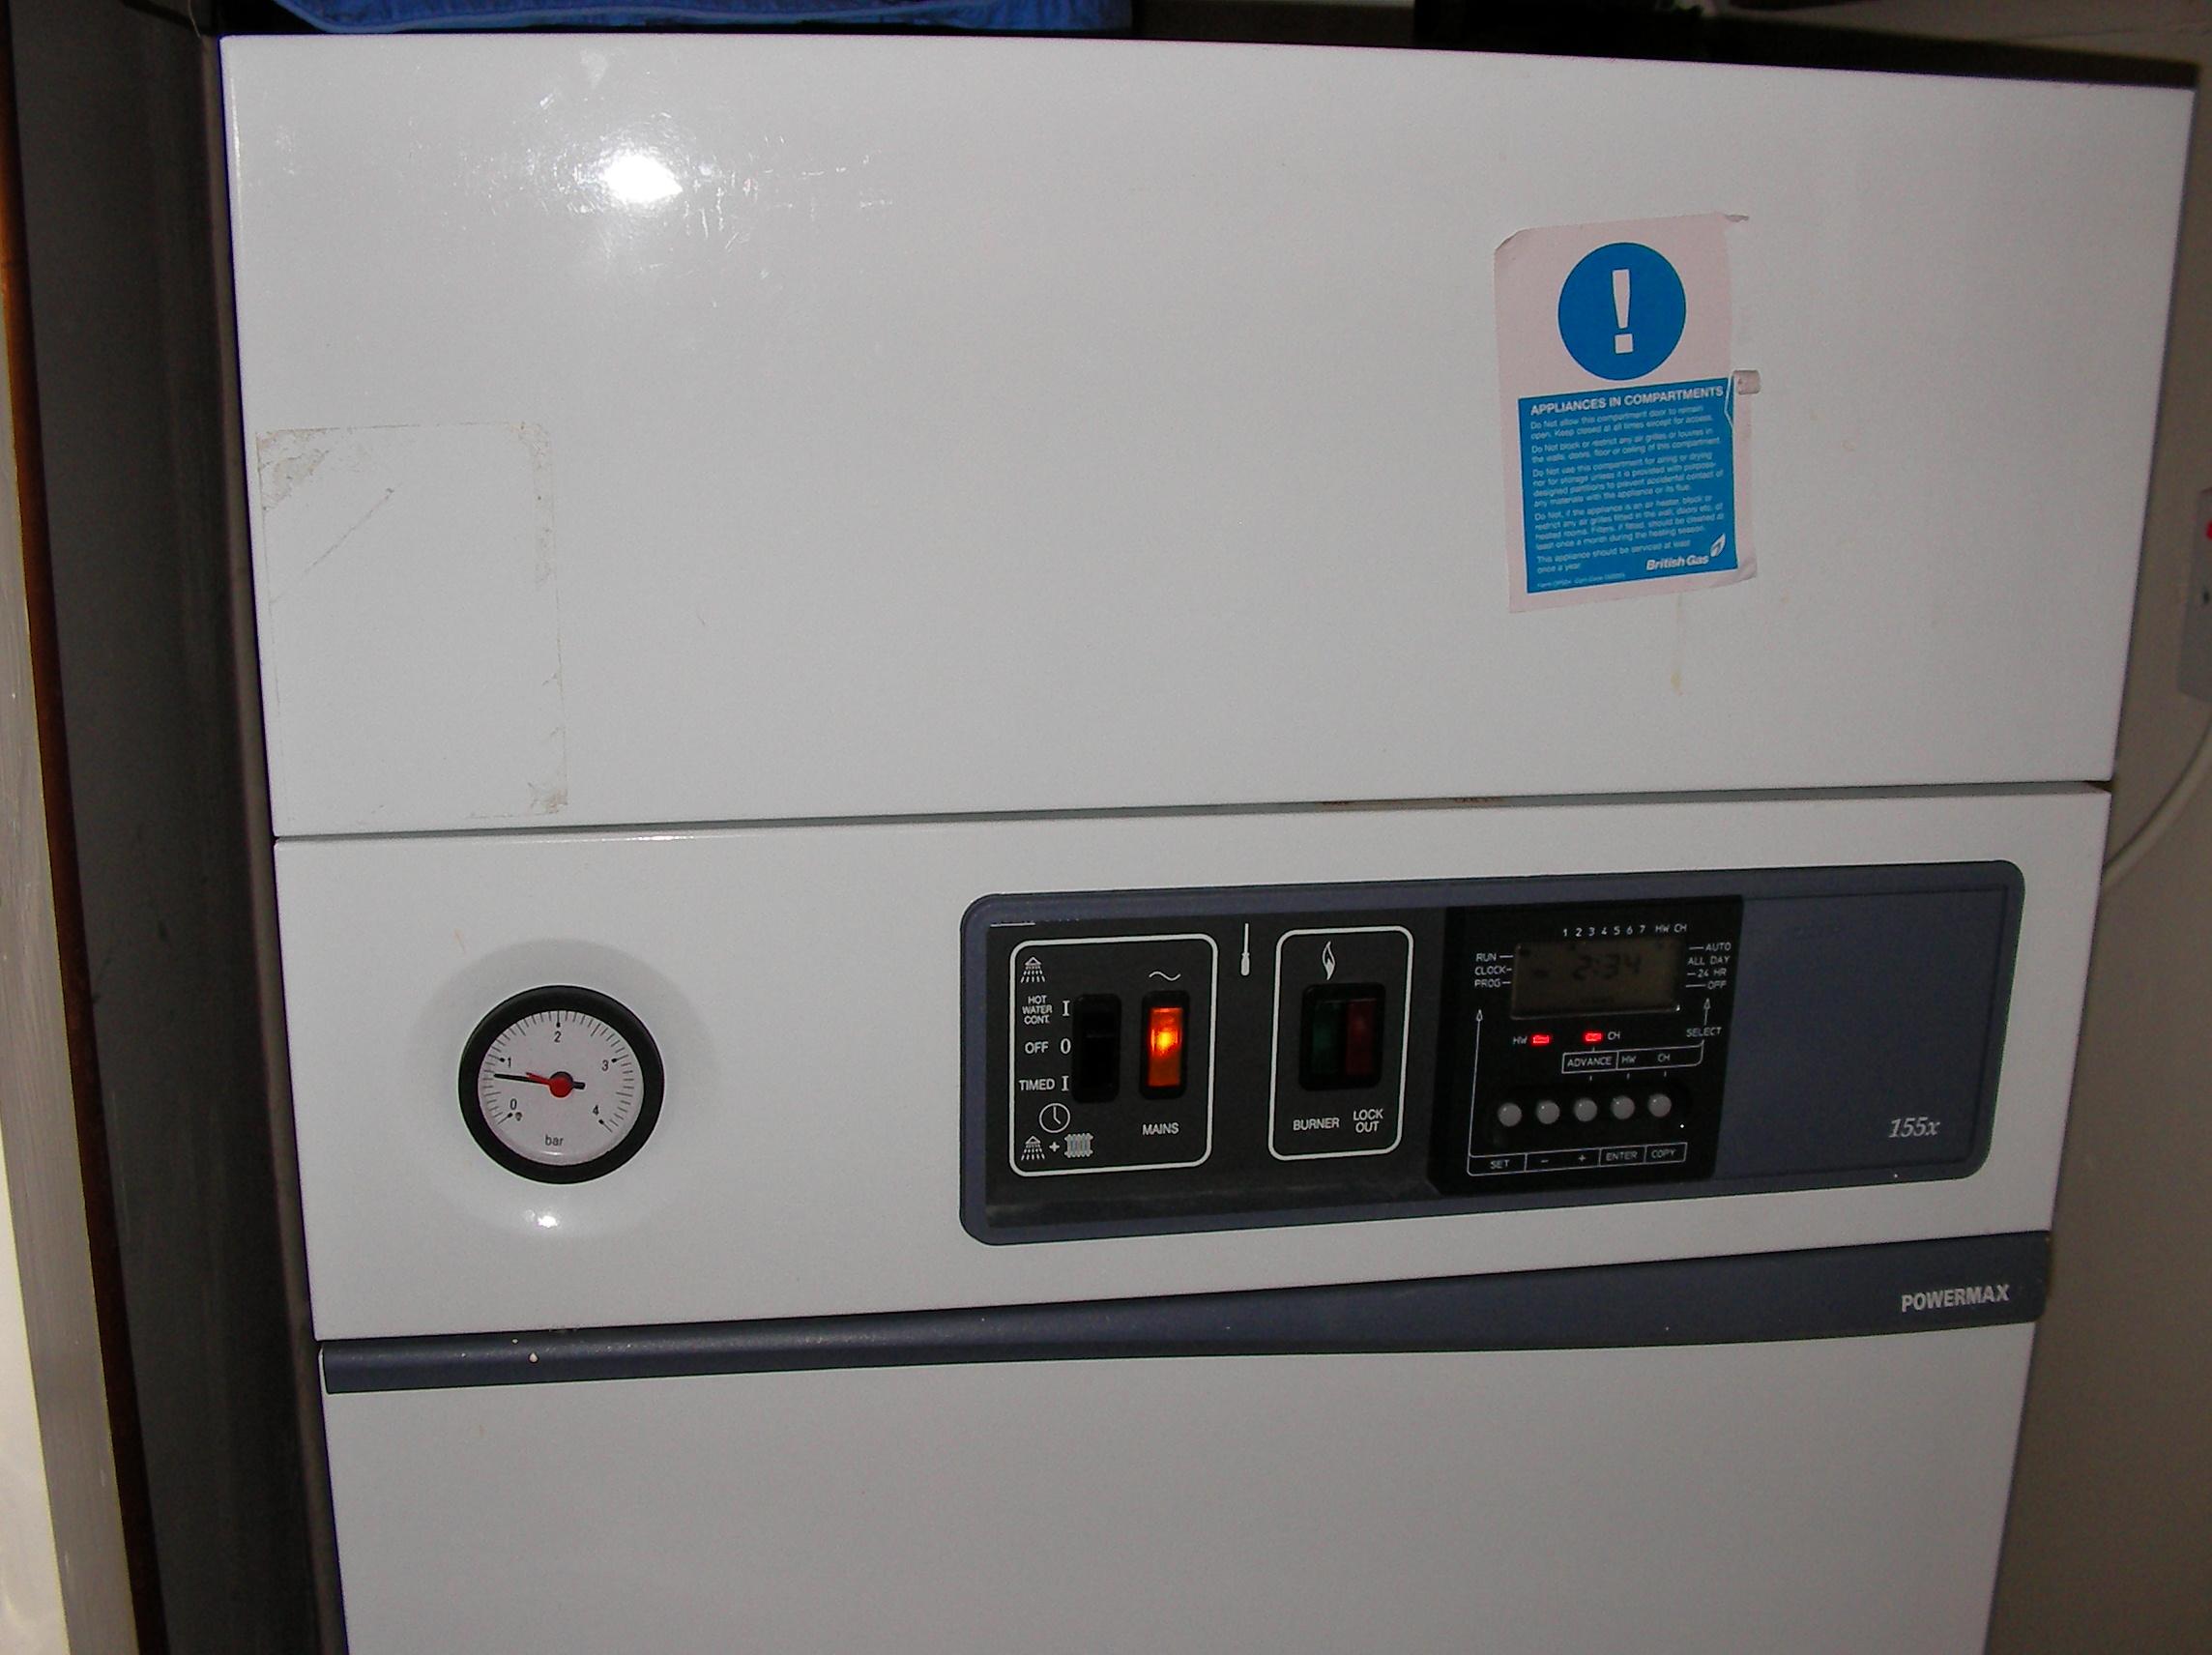 Time to Replace or Repair the old Gas Boiler | Mrs Tara Plumbing